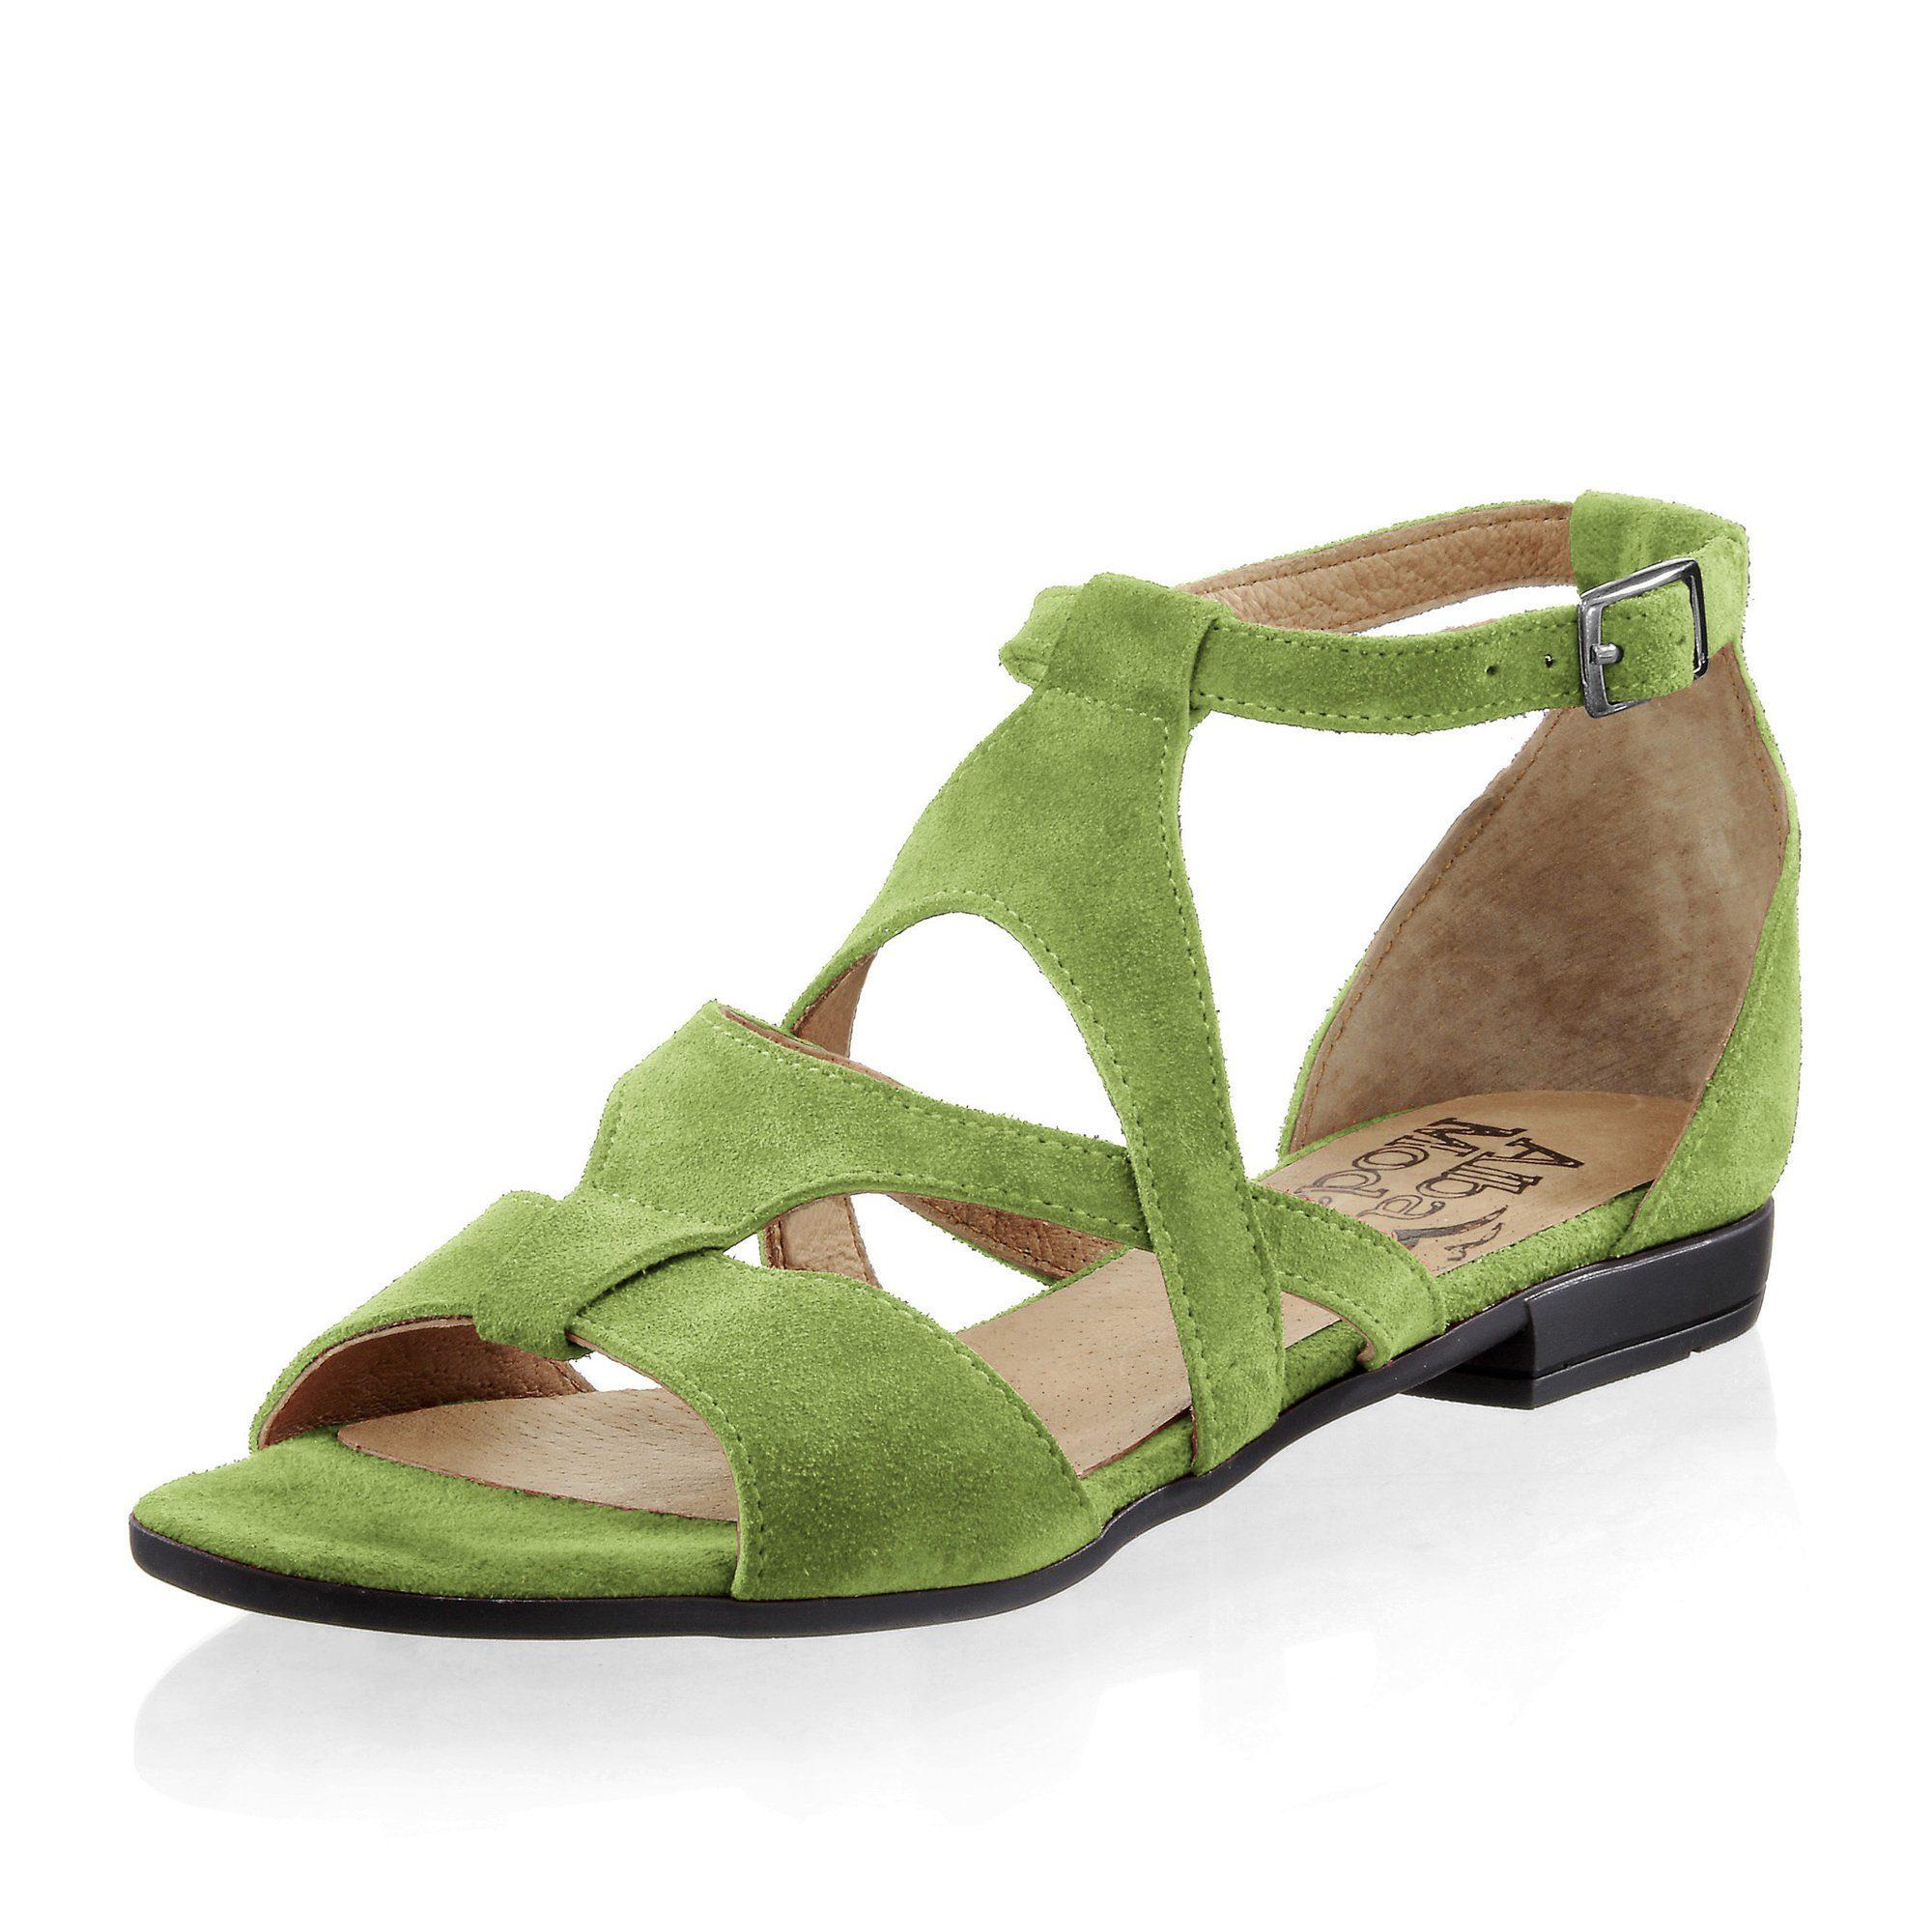 Alba Moda Sandalette, grün, mint